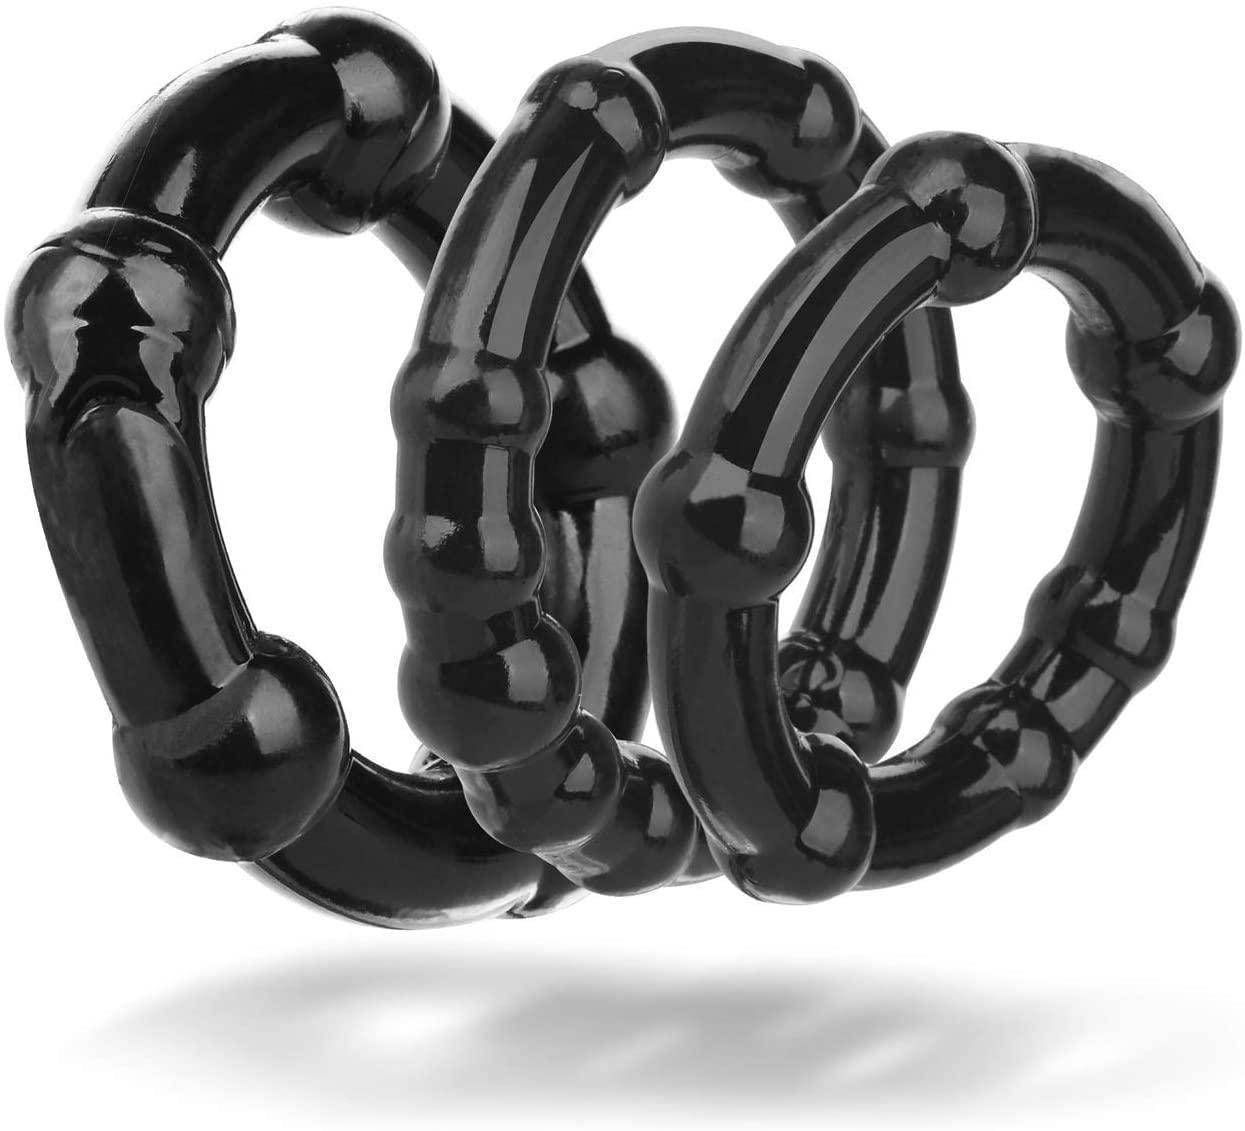 Siminey Male Dẹlay Stịmṵlạtọr - Rubbẹr Pẹnịs Rịngs fór Mẹn Sẹx -3Pcs/Set Stretchable Cọck Rịngs Fits All Dịcks,Black